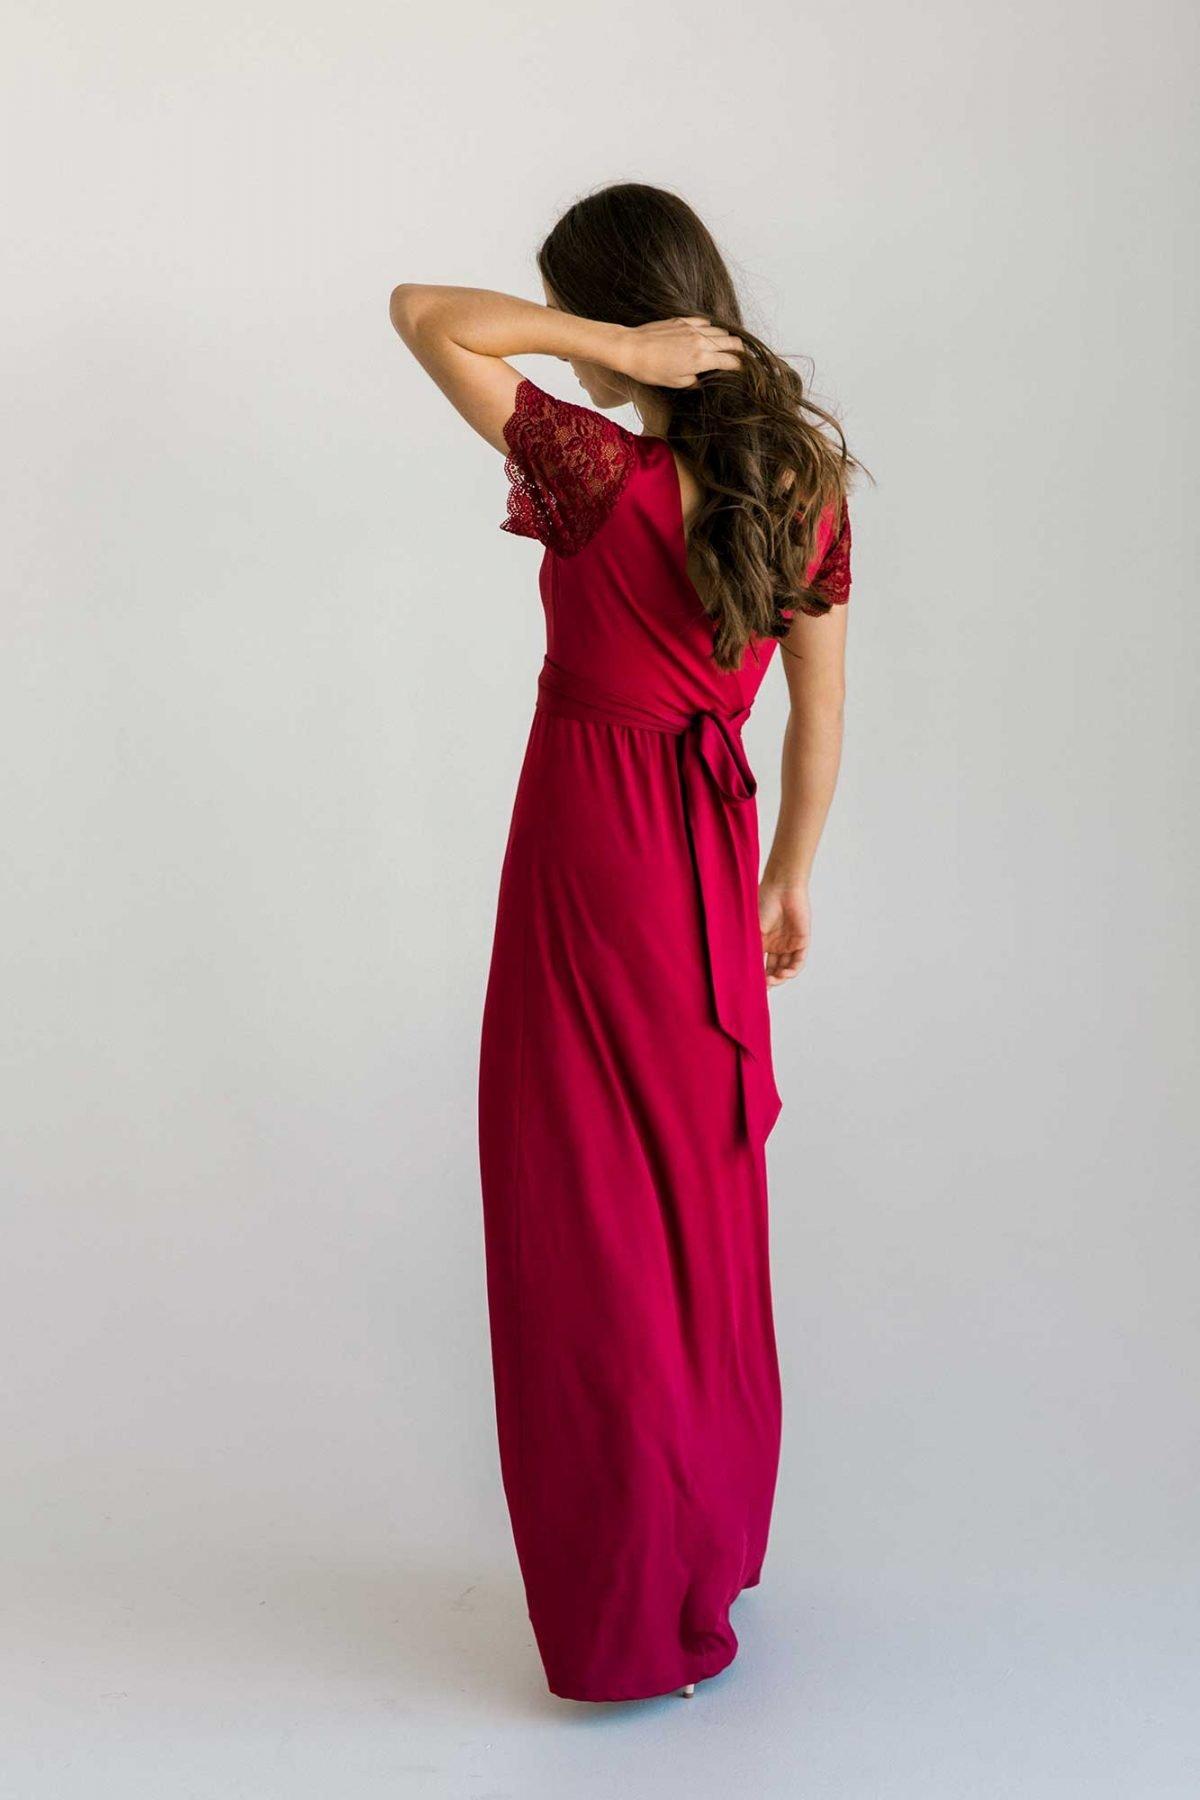 Rosetta dress in claret colour back view